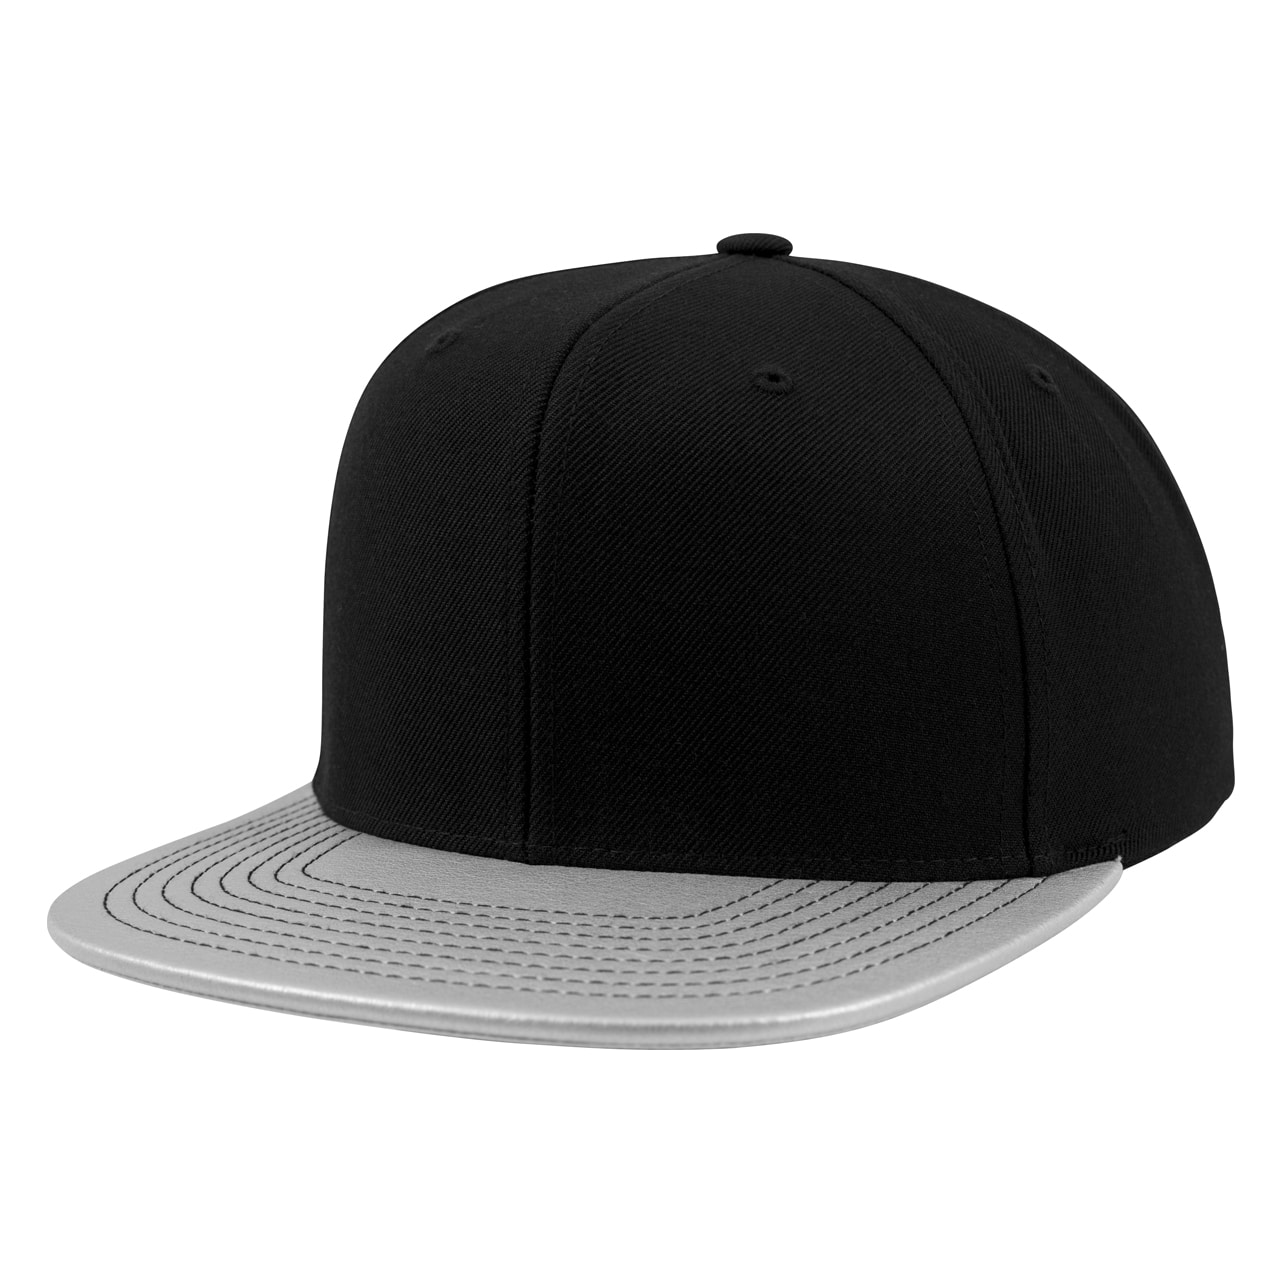 0d5c50345eeb5 Metallic Visor Snapback Cap - Silver